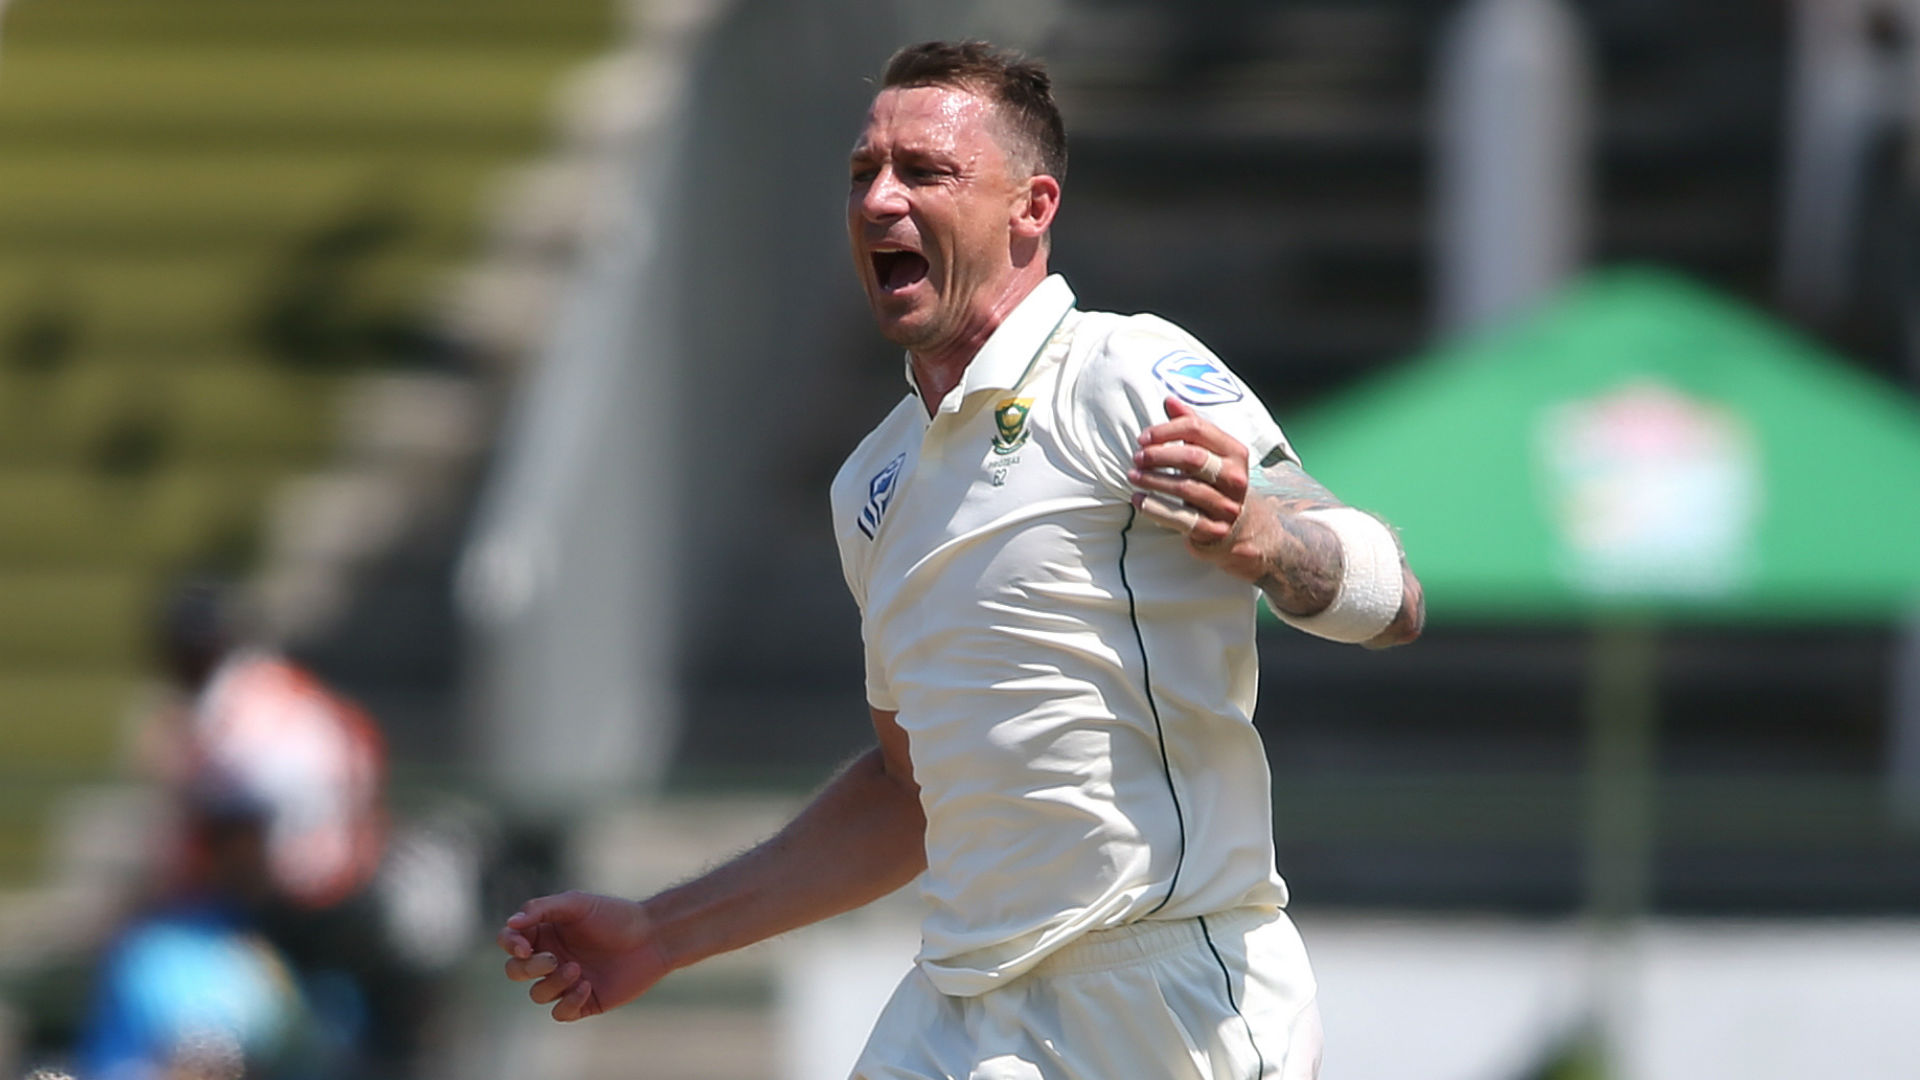 Steyn superb as Sri Lanka falter